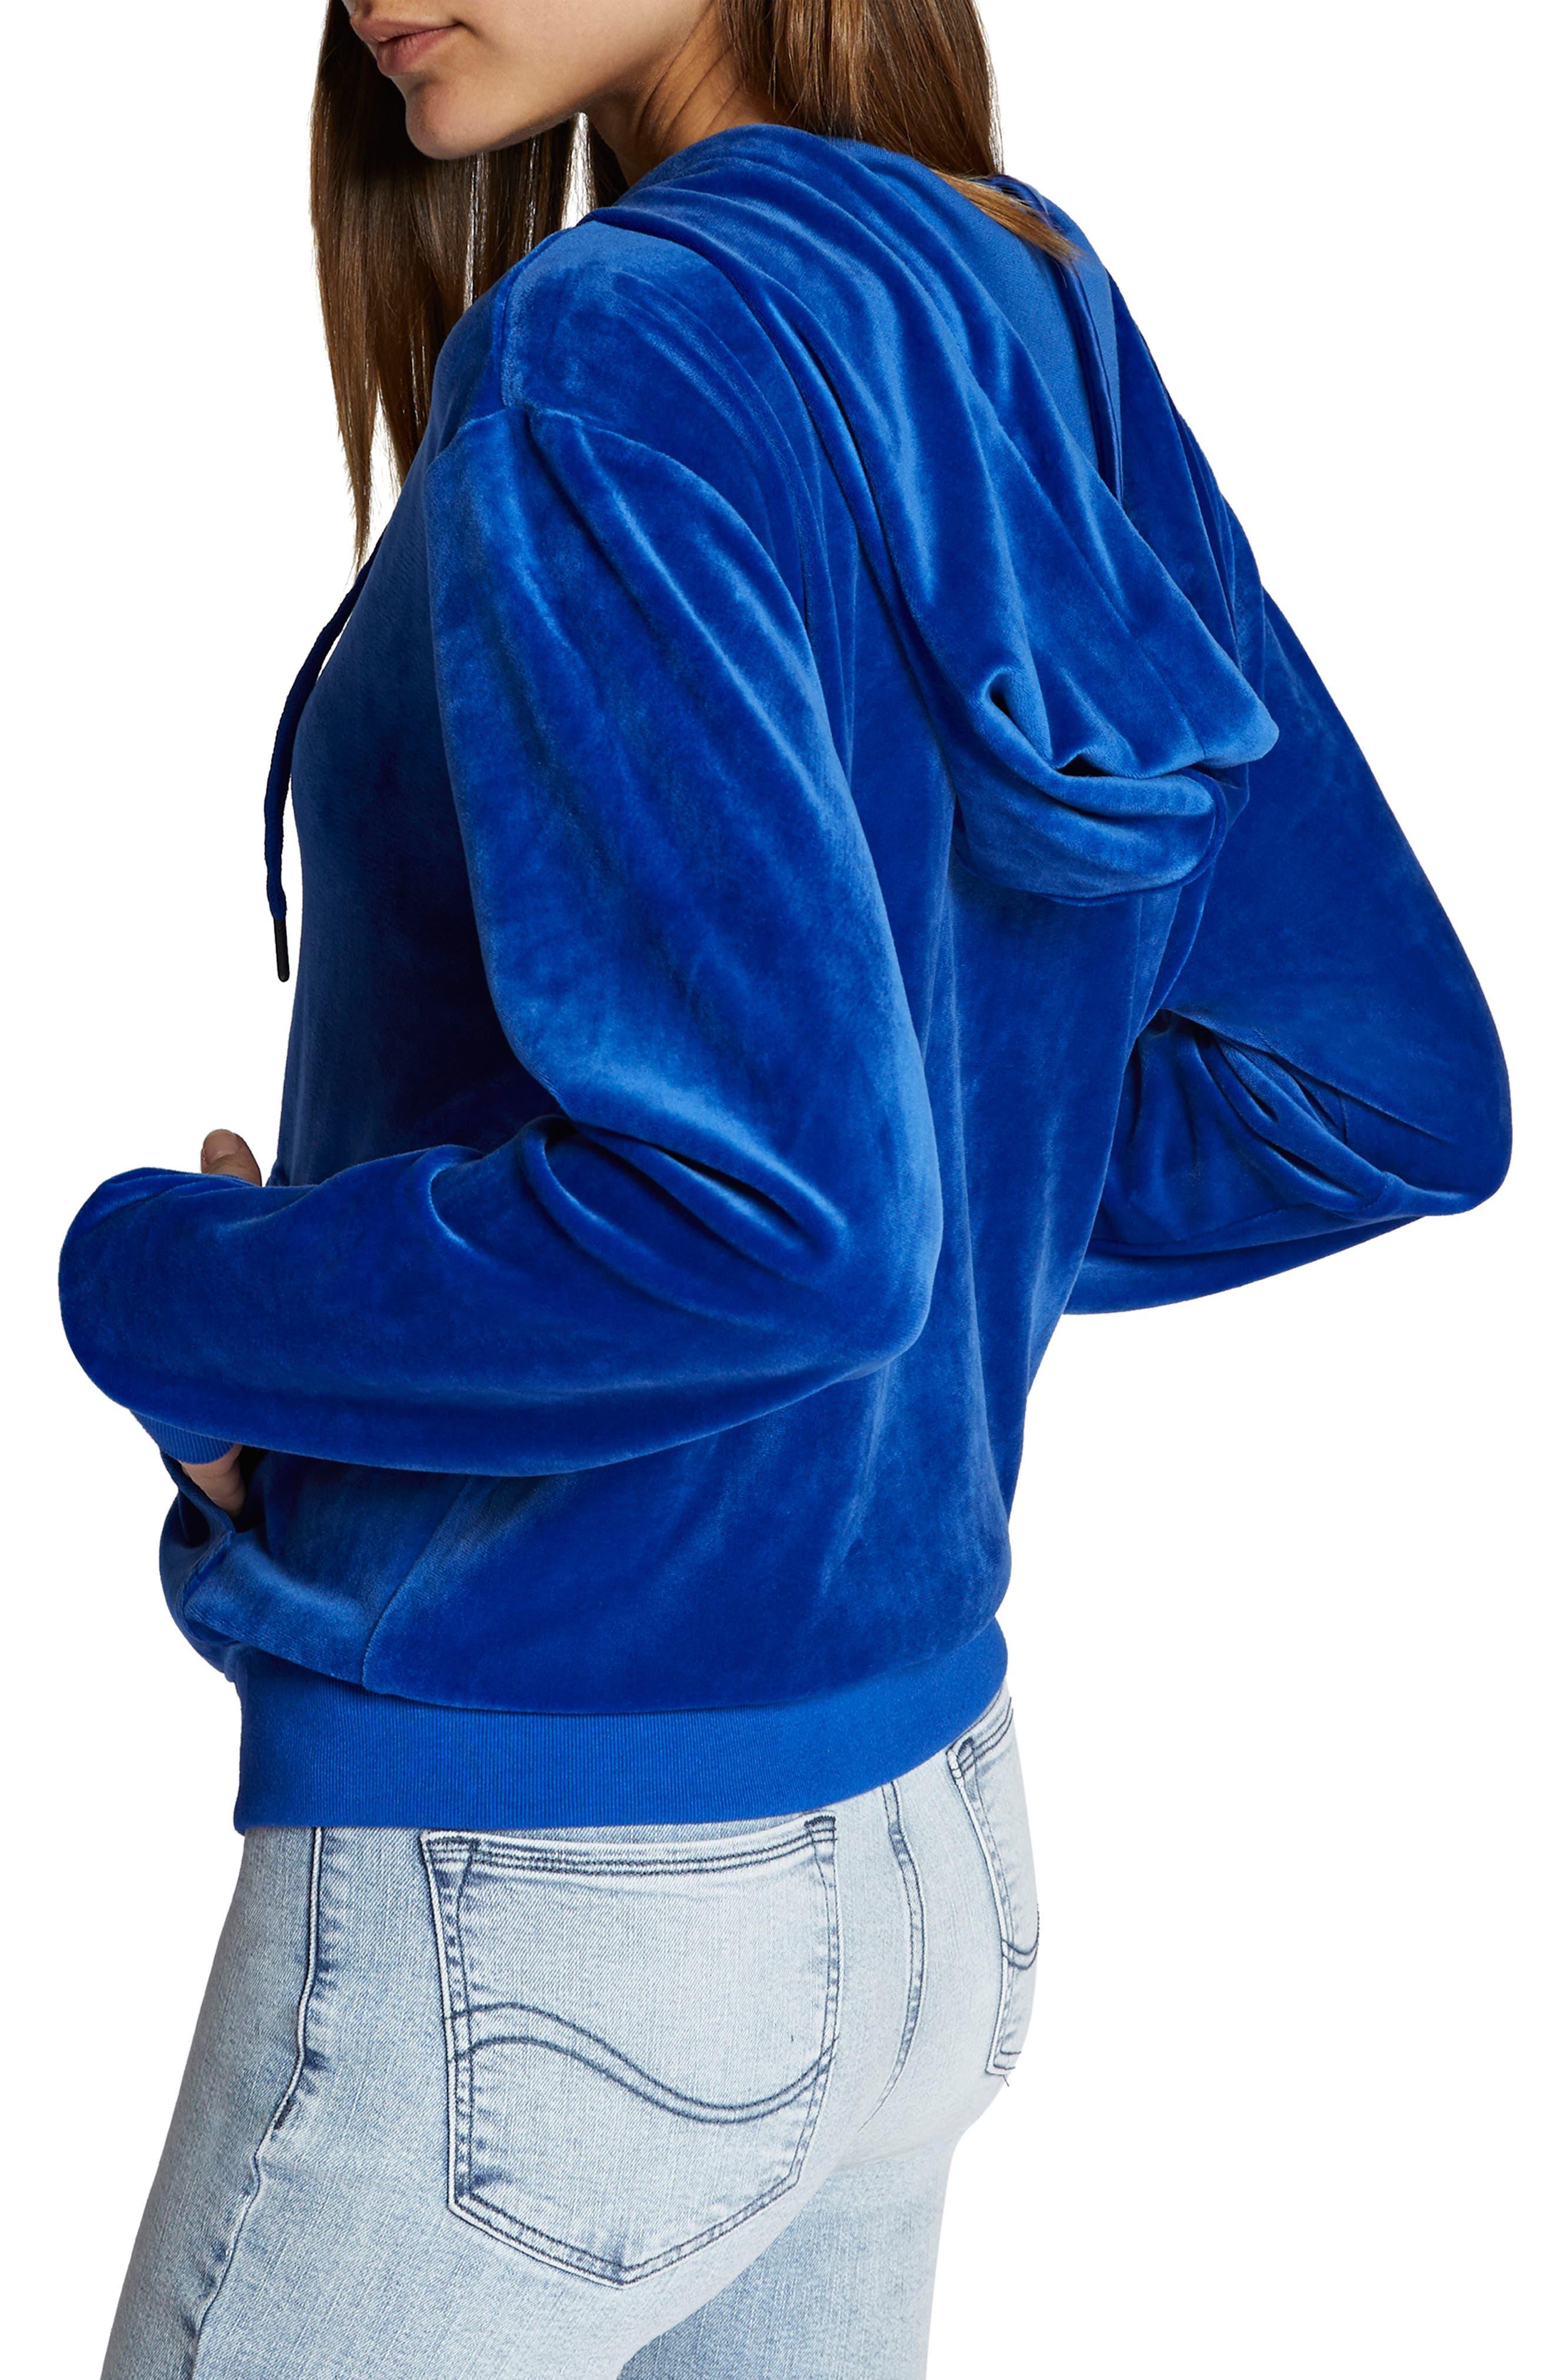 Melrose Raisin Hooded Jacket,                             Alternate thumbnail 3, color,                             ELECTRIC BLUE